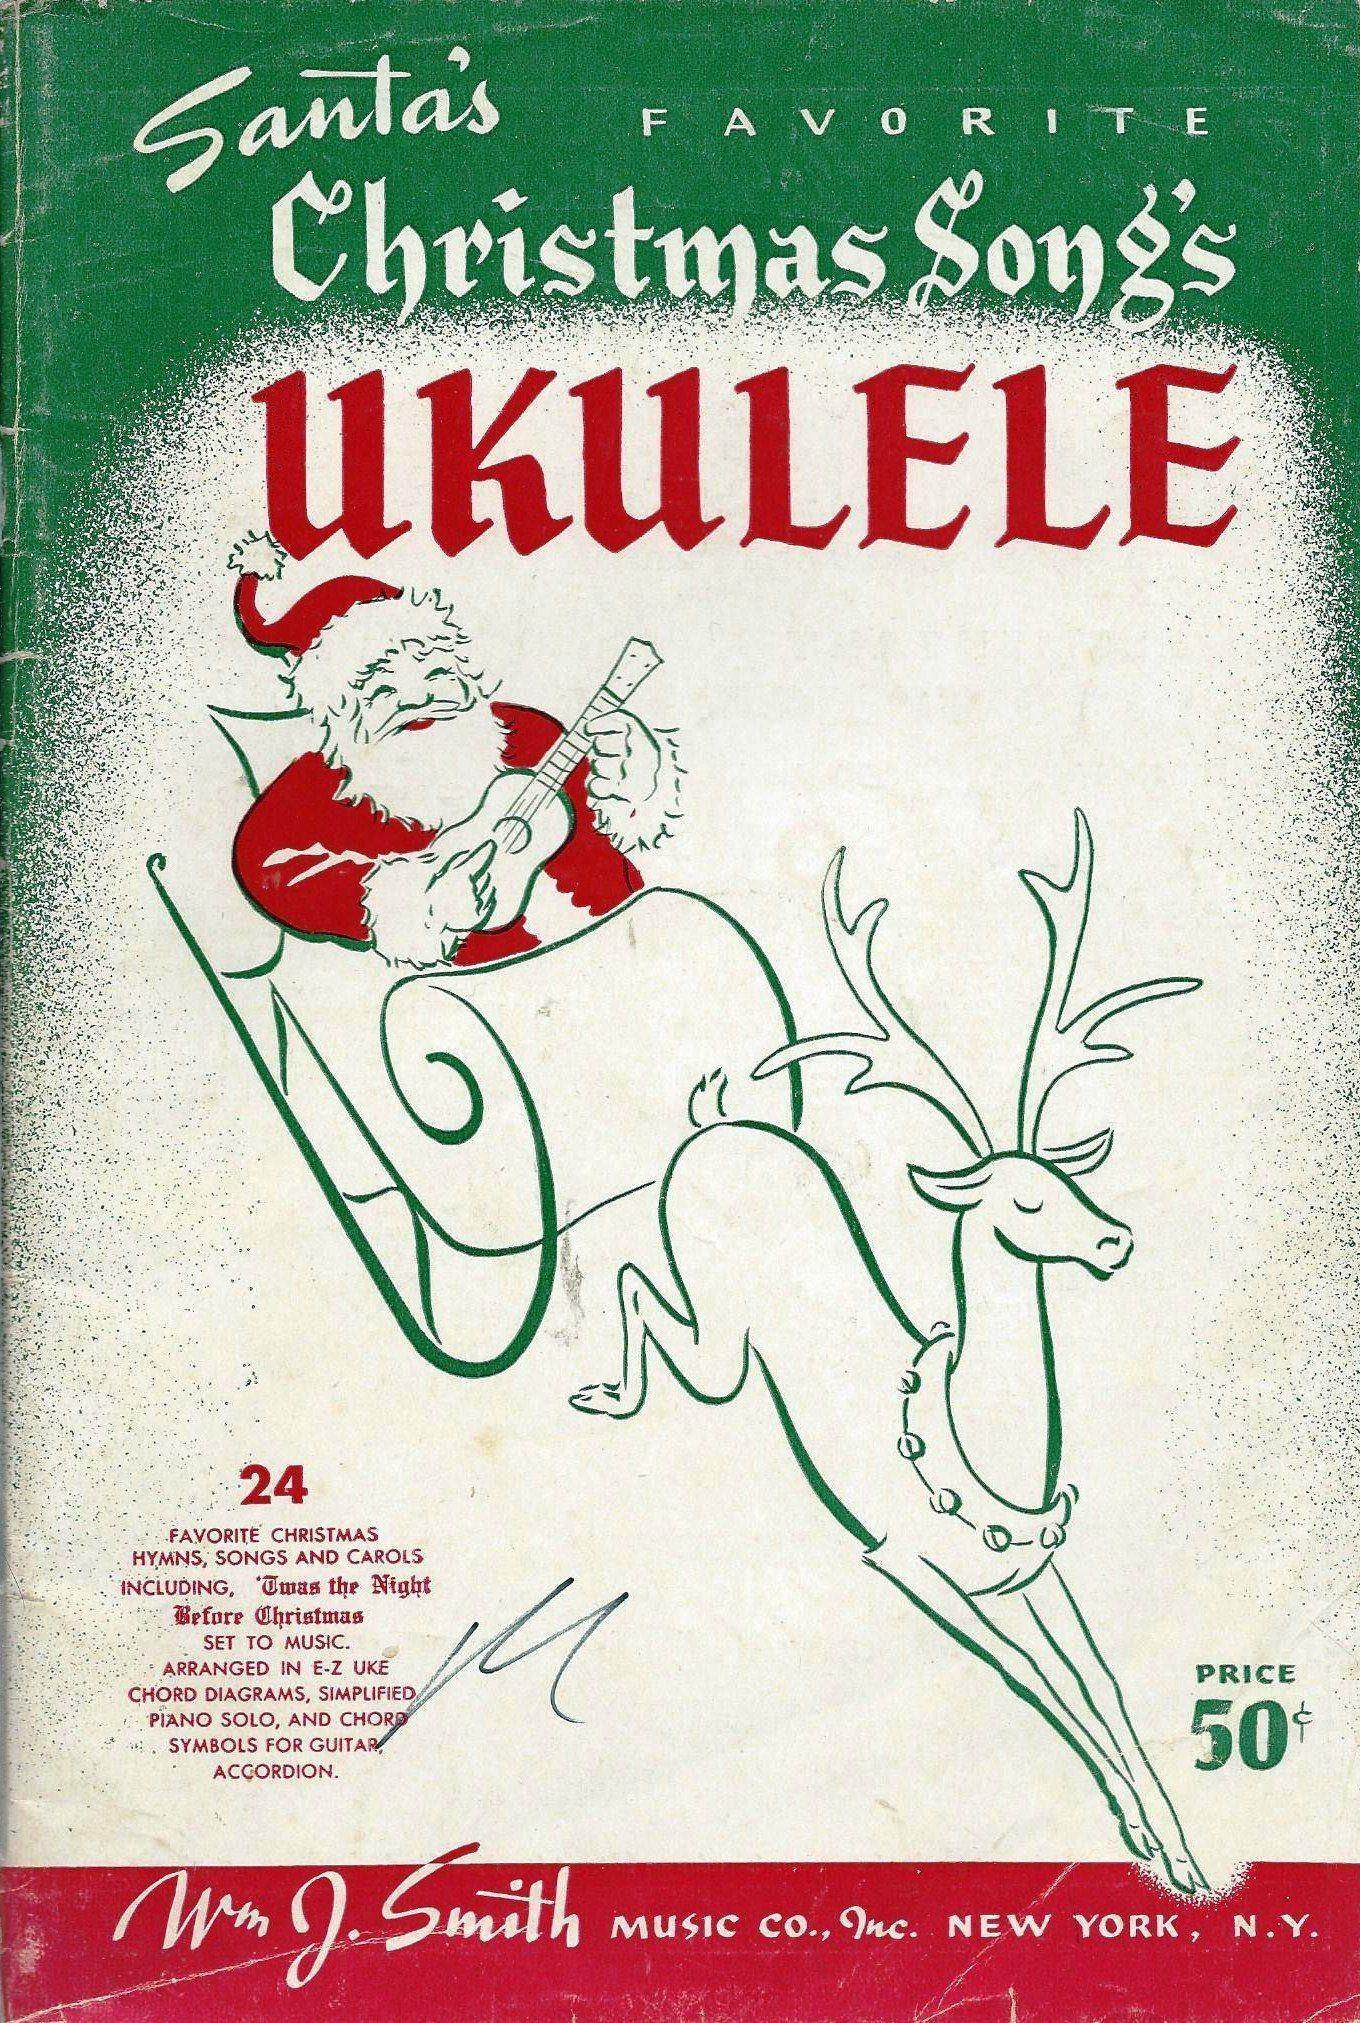 ukulele santas favorite christmas songs kamiki amazoncom books - Favorite Christmas Songs